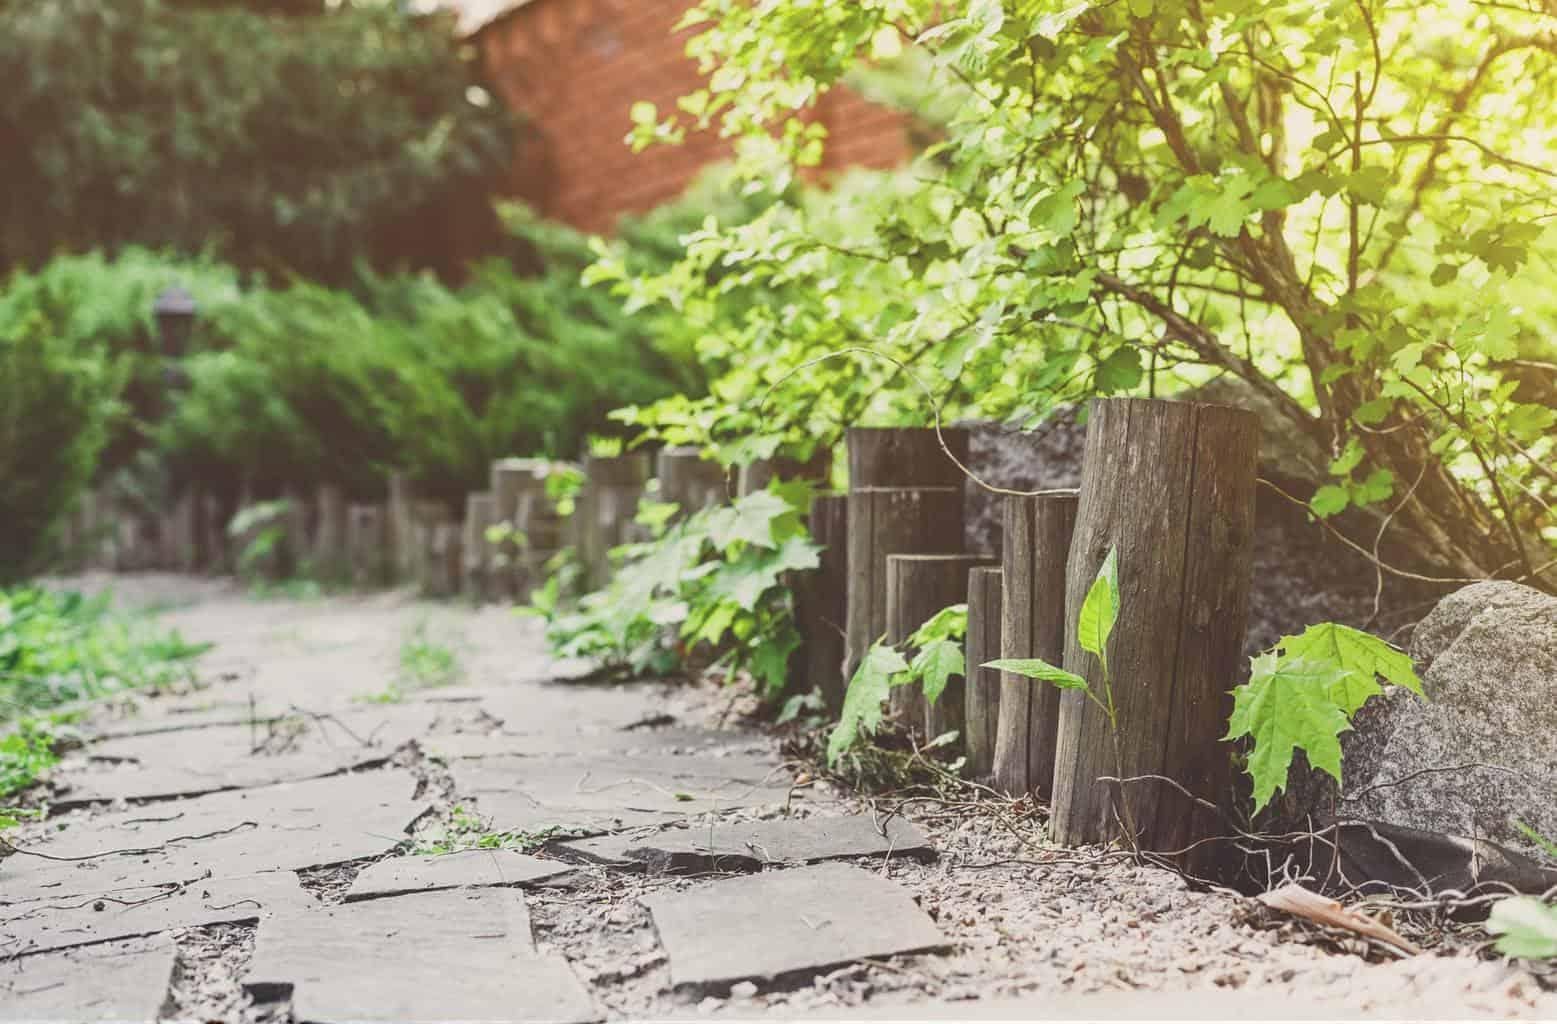 Landscape design, evergreen bushes and path